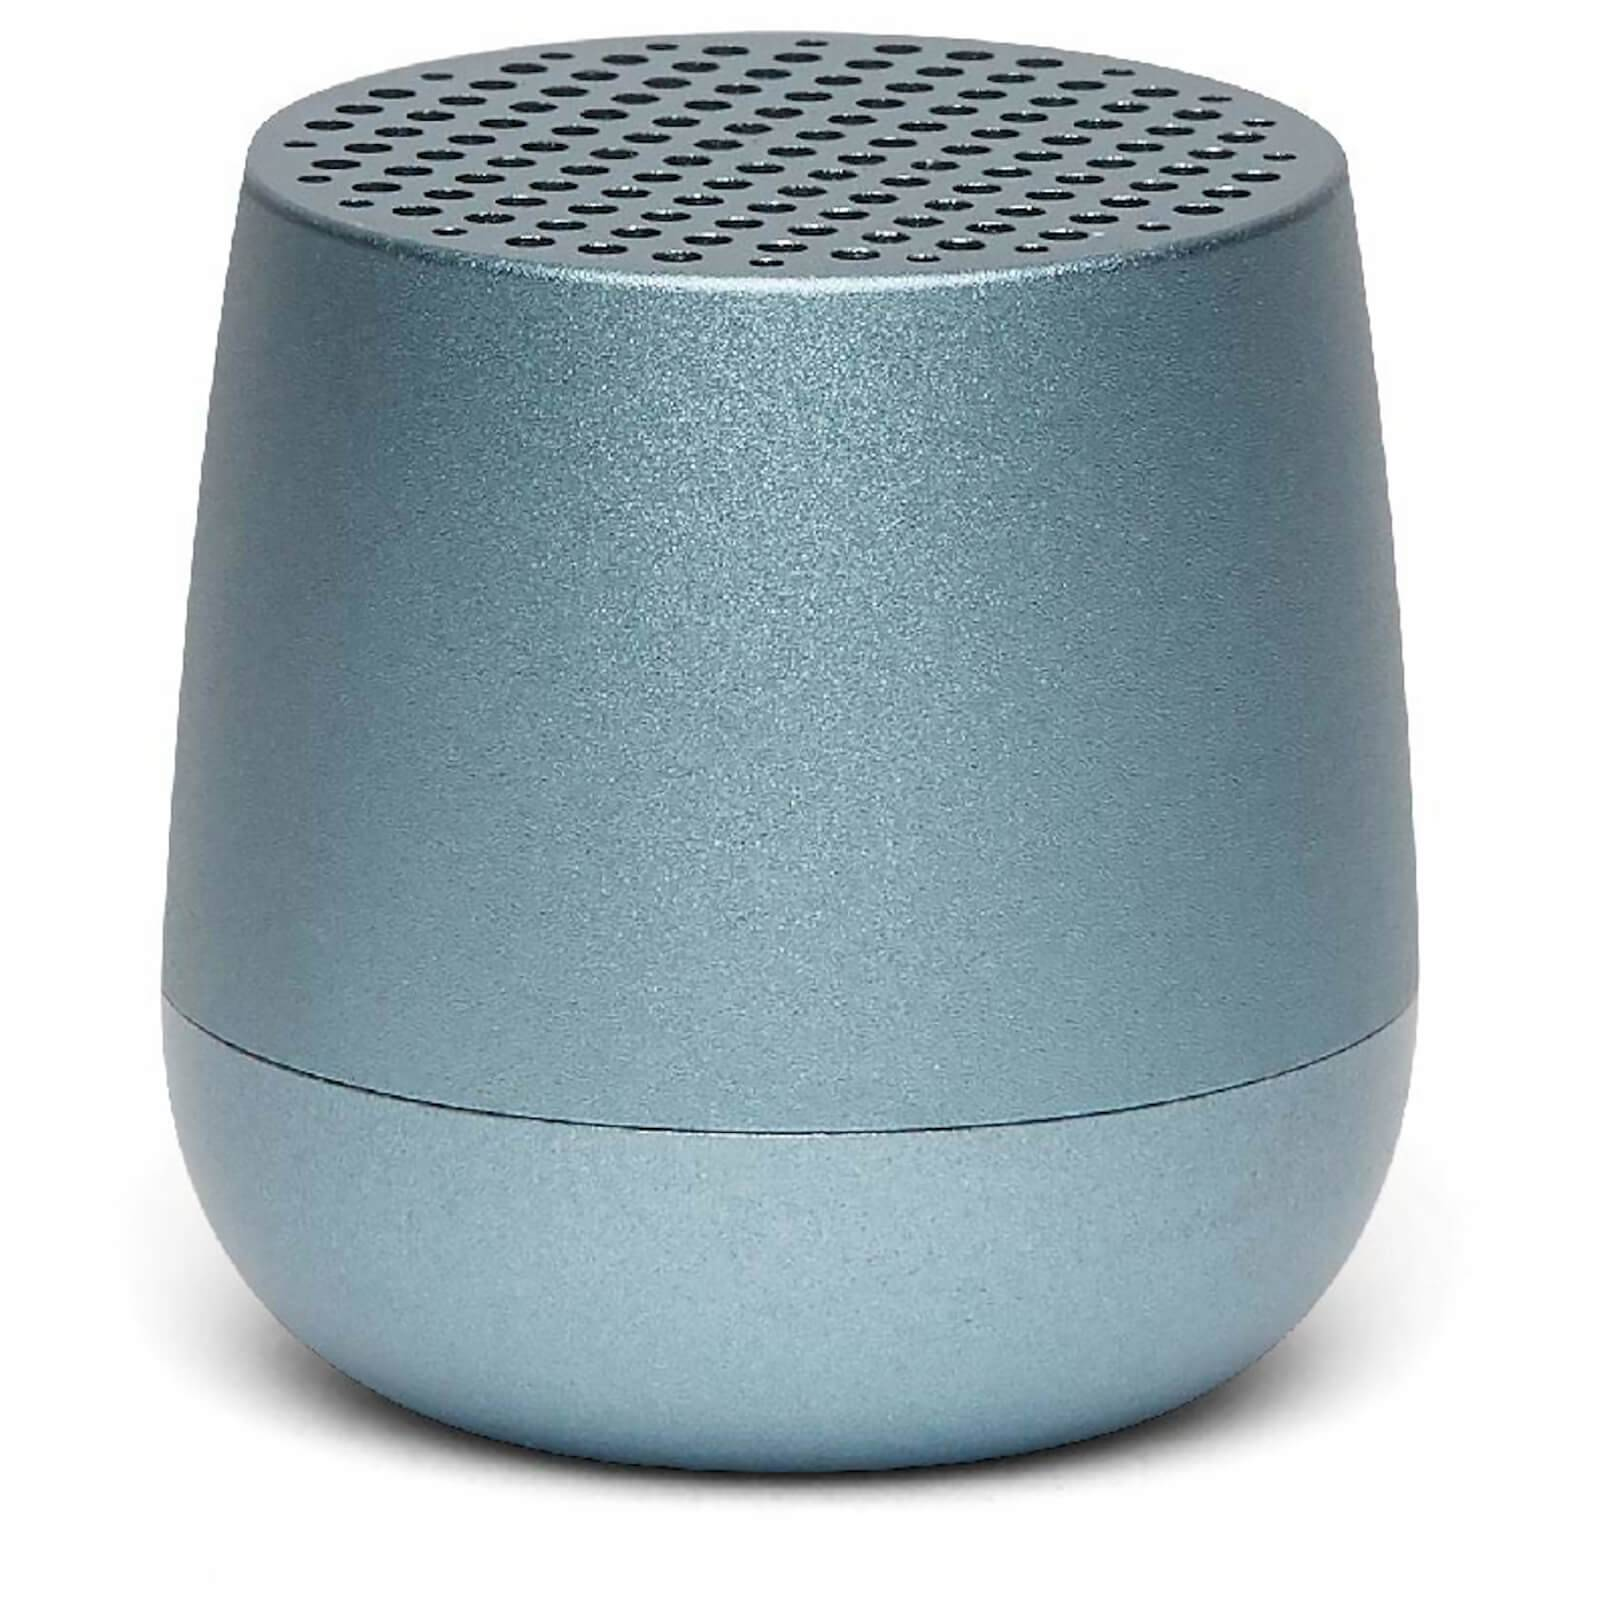 Lexon MINO Bluetooth Speaker - Light Blue